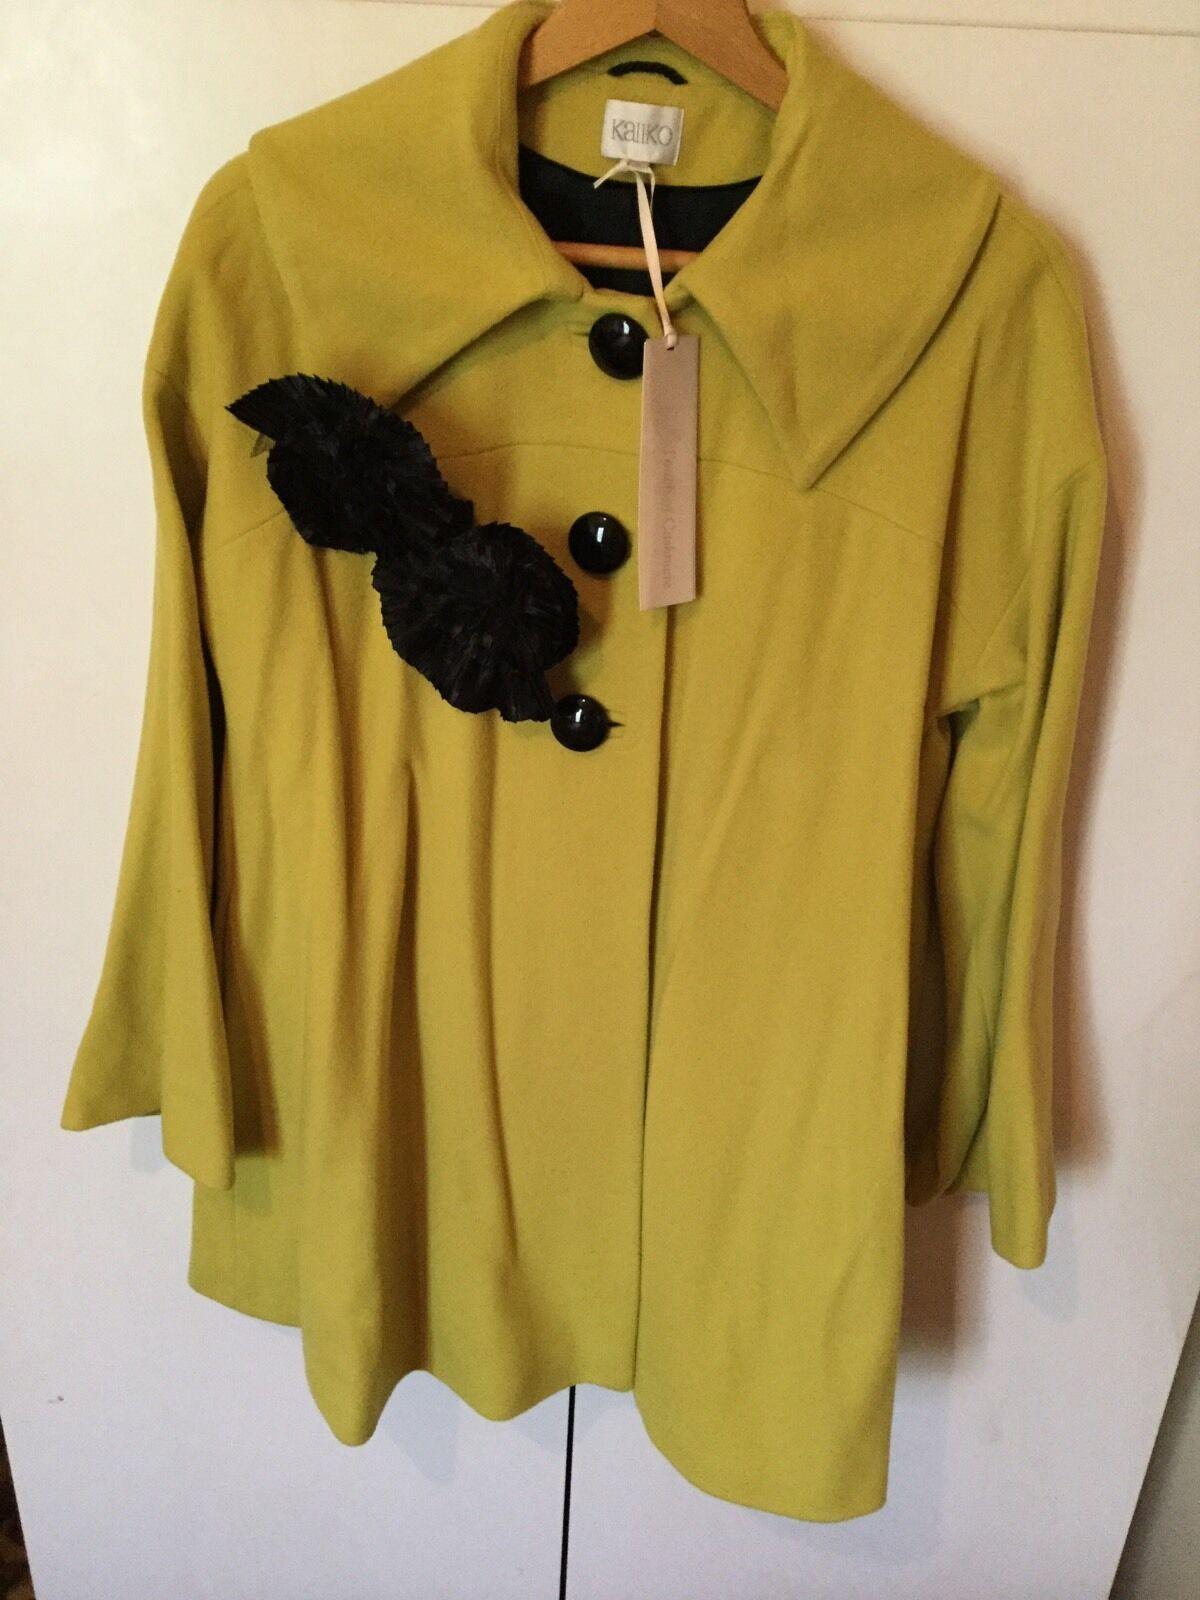 NWT Designer KALIKO Wool And Cashmere Blend pinktte Detail Coat-Fit